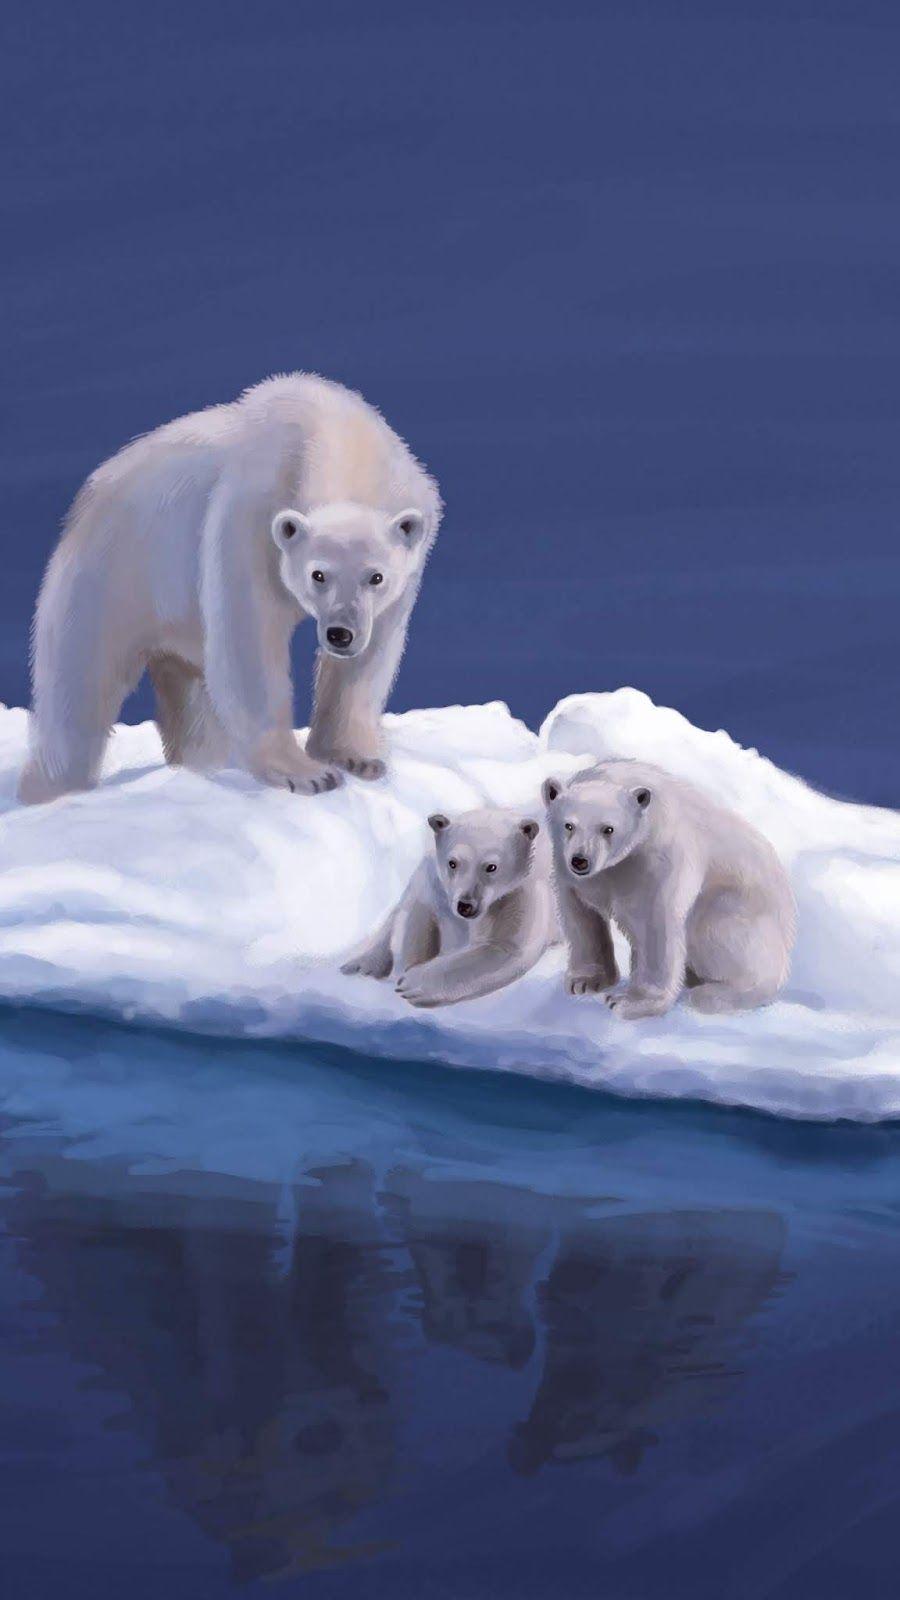 Pin On Animals Animal polar bears on ice wallpapers hd